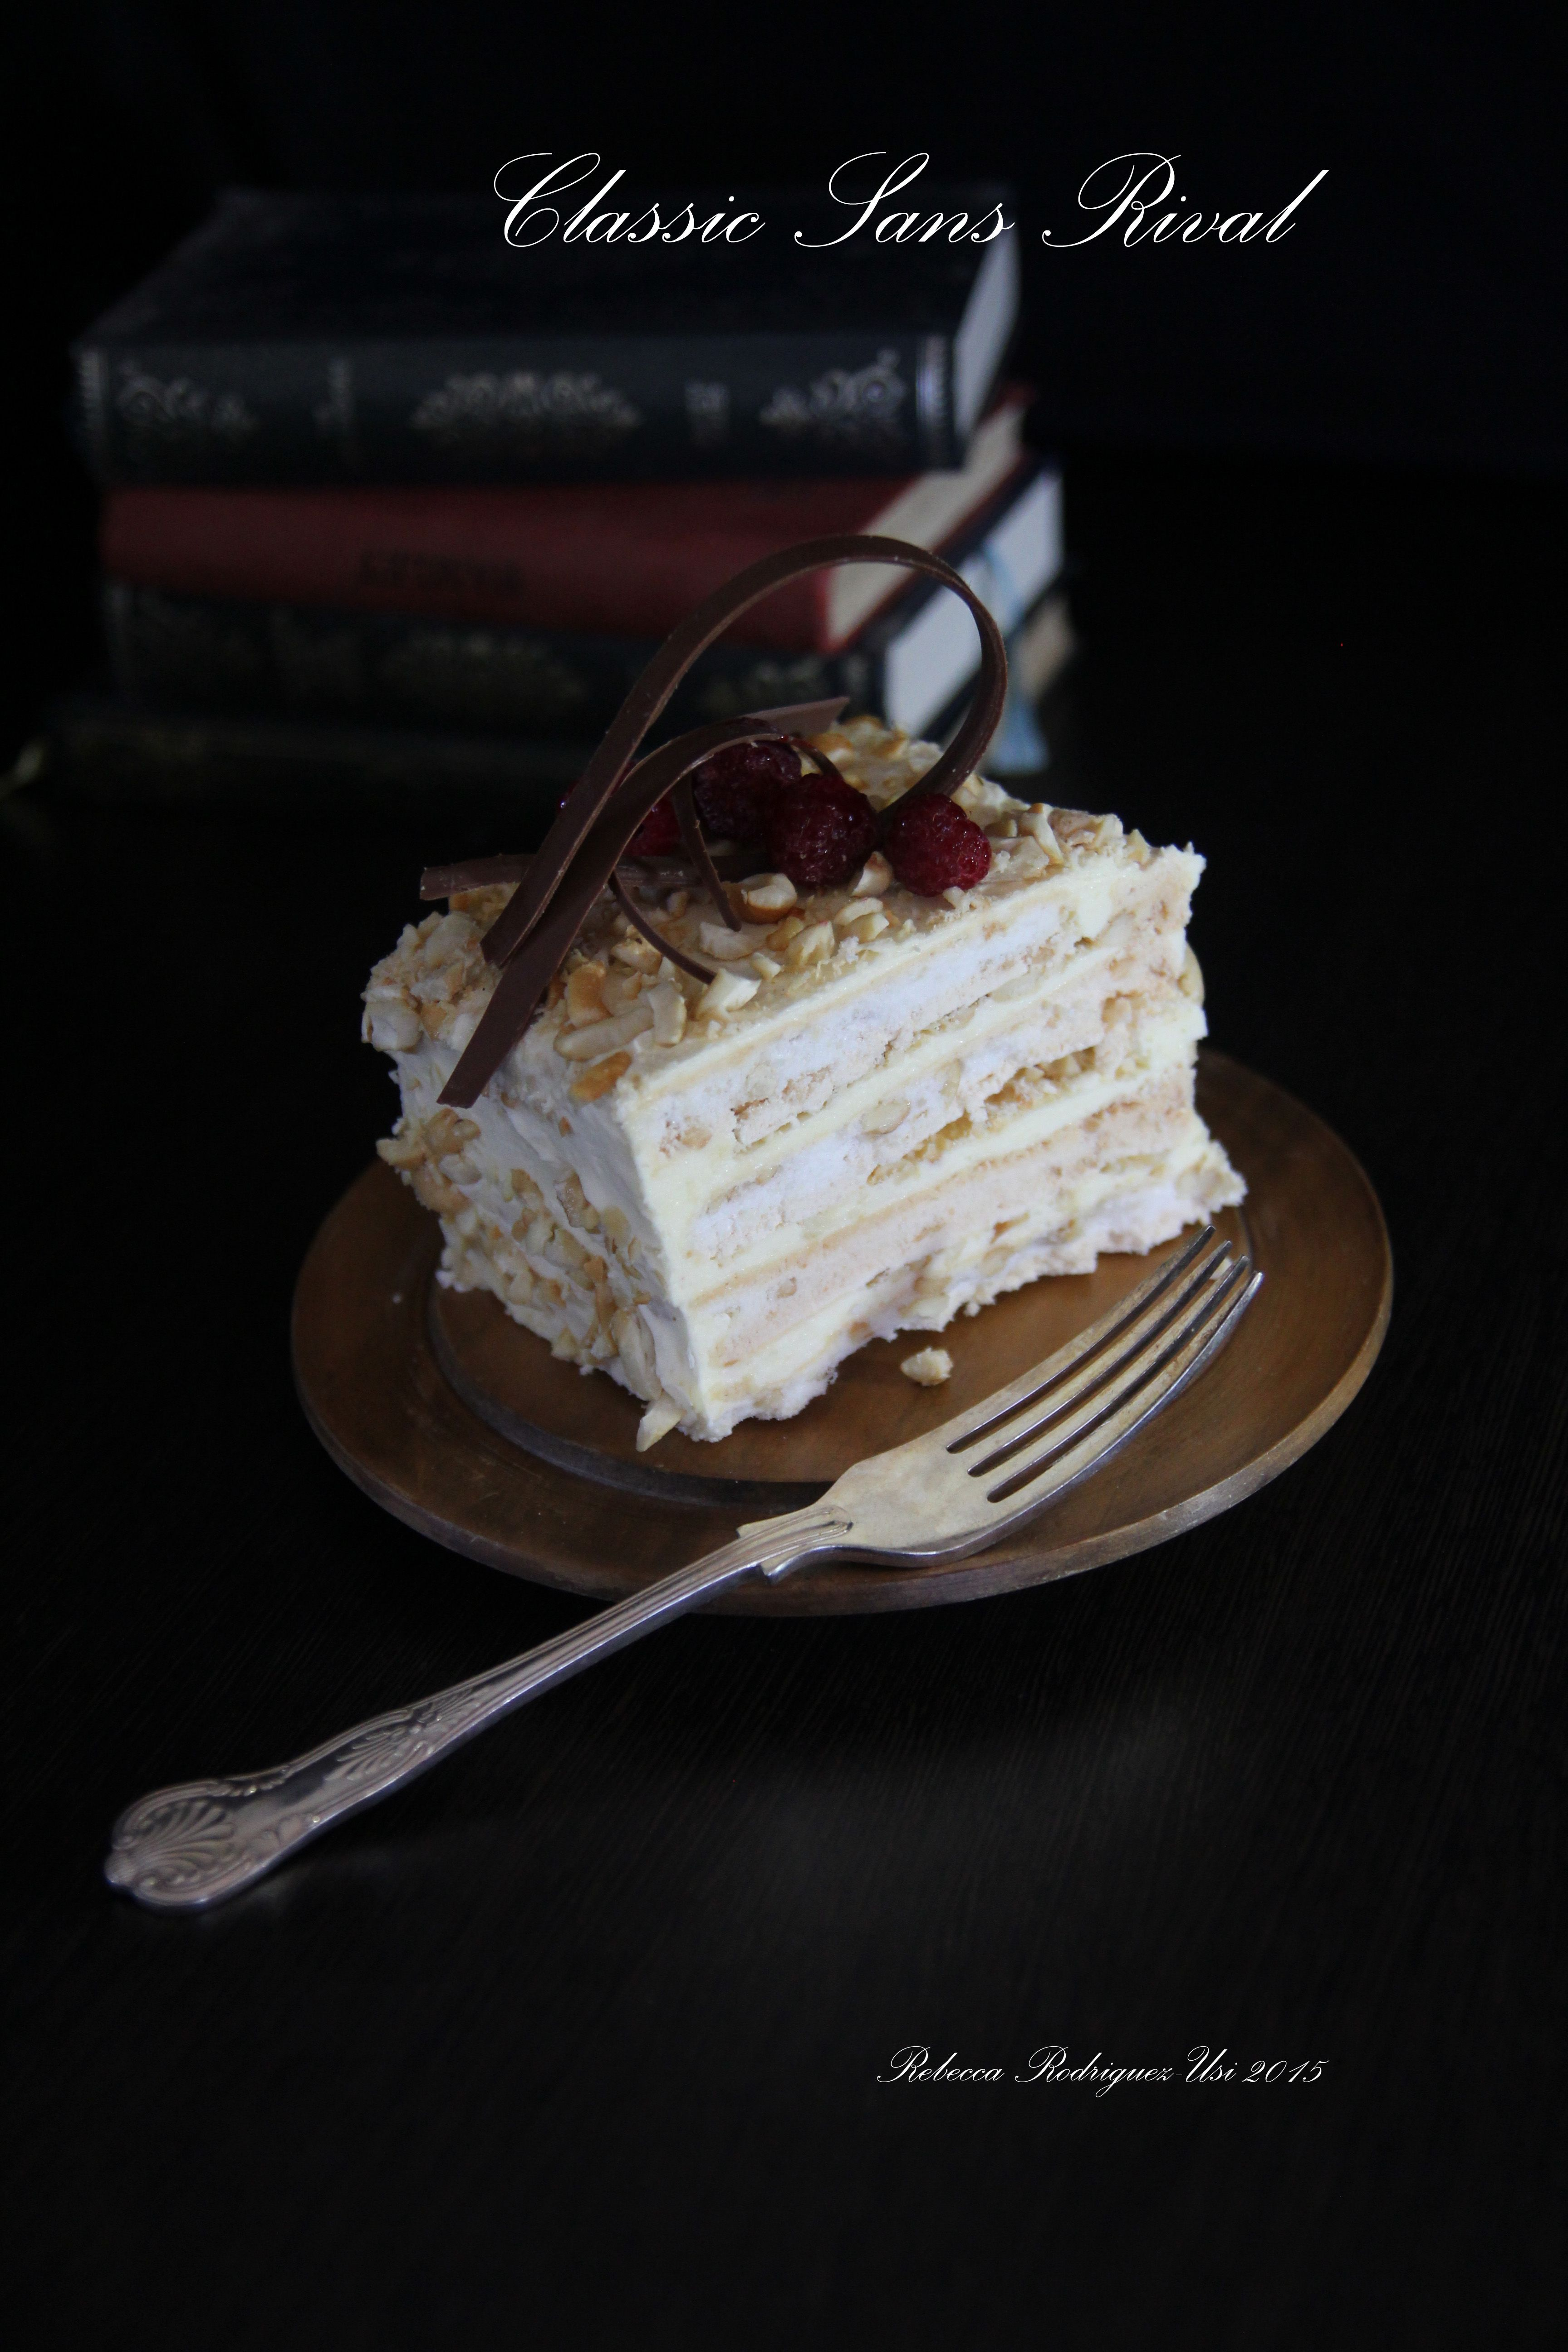 Classic sans rival food dark food photography sans rival